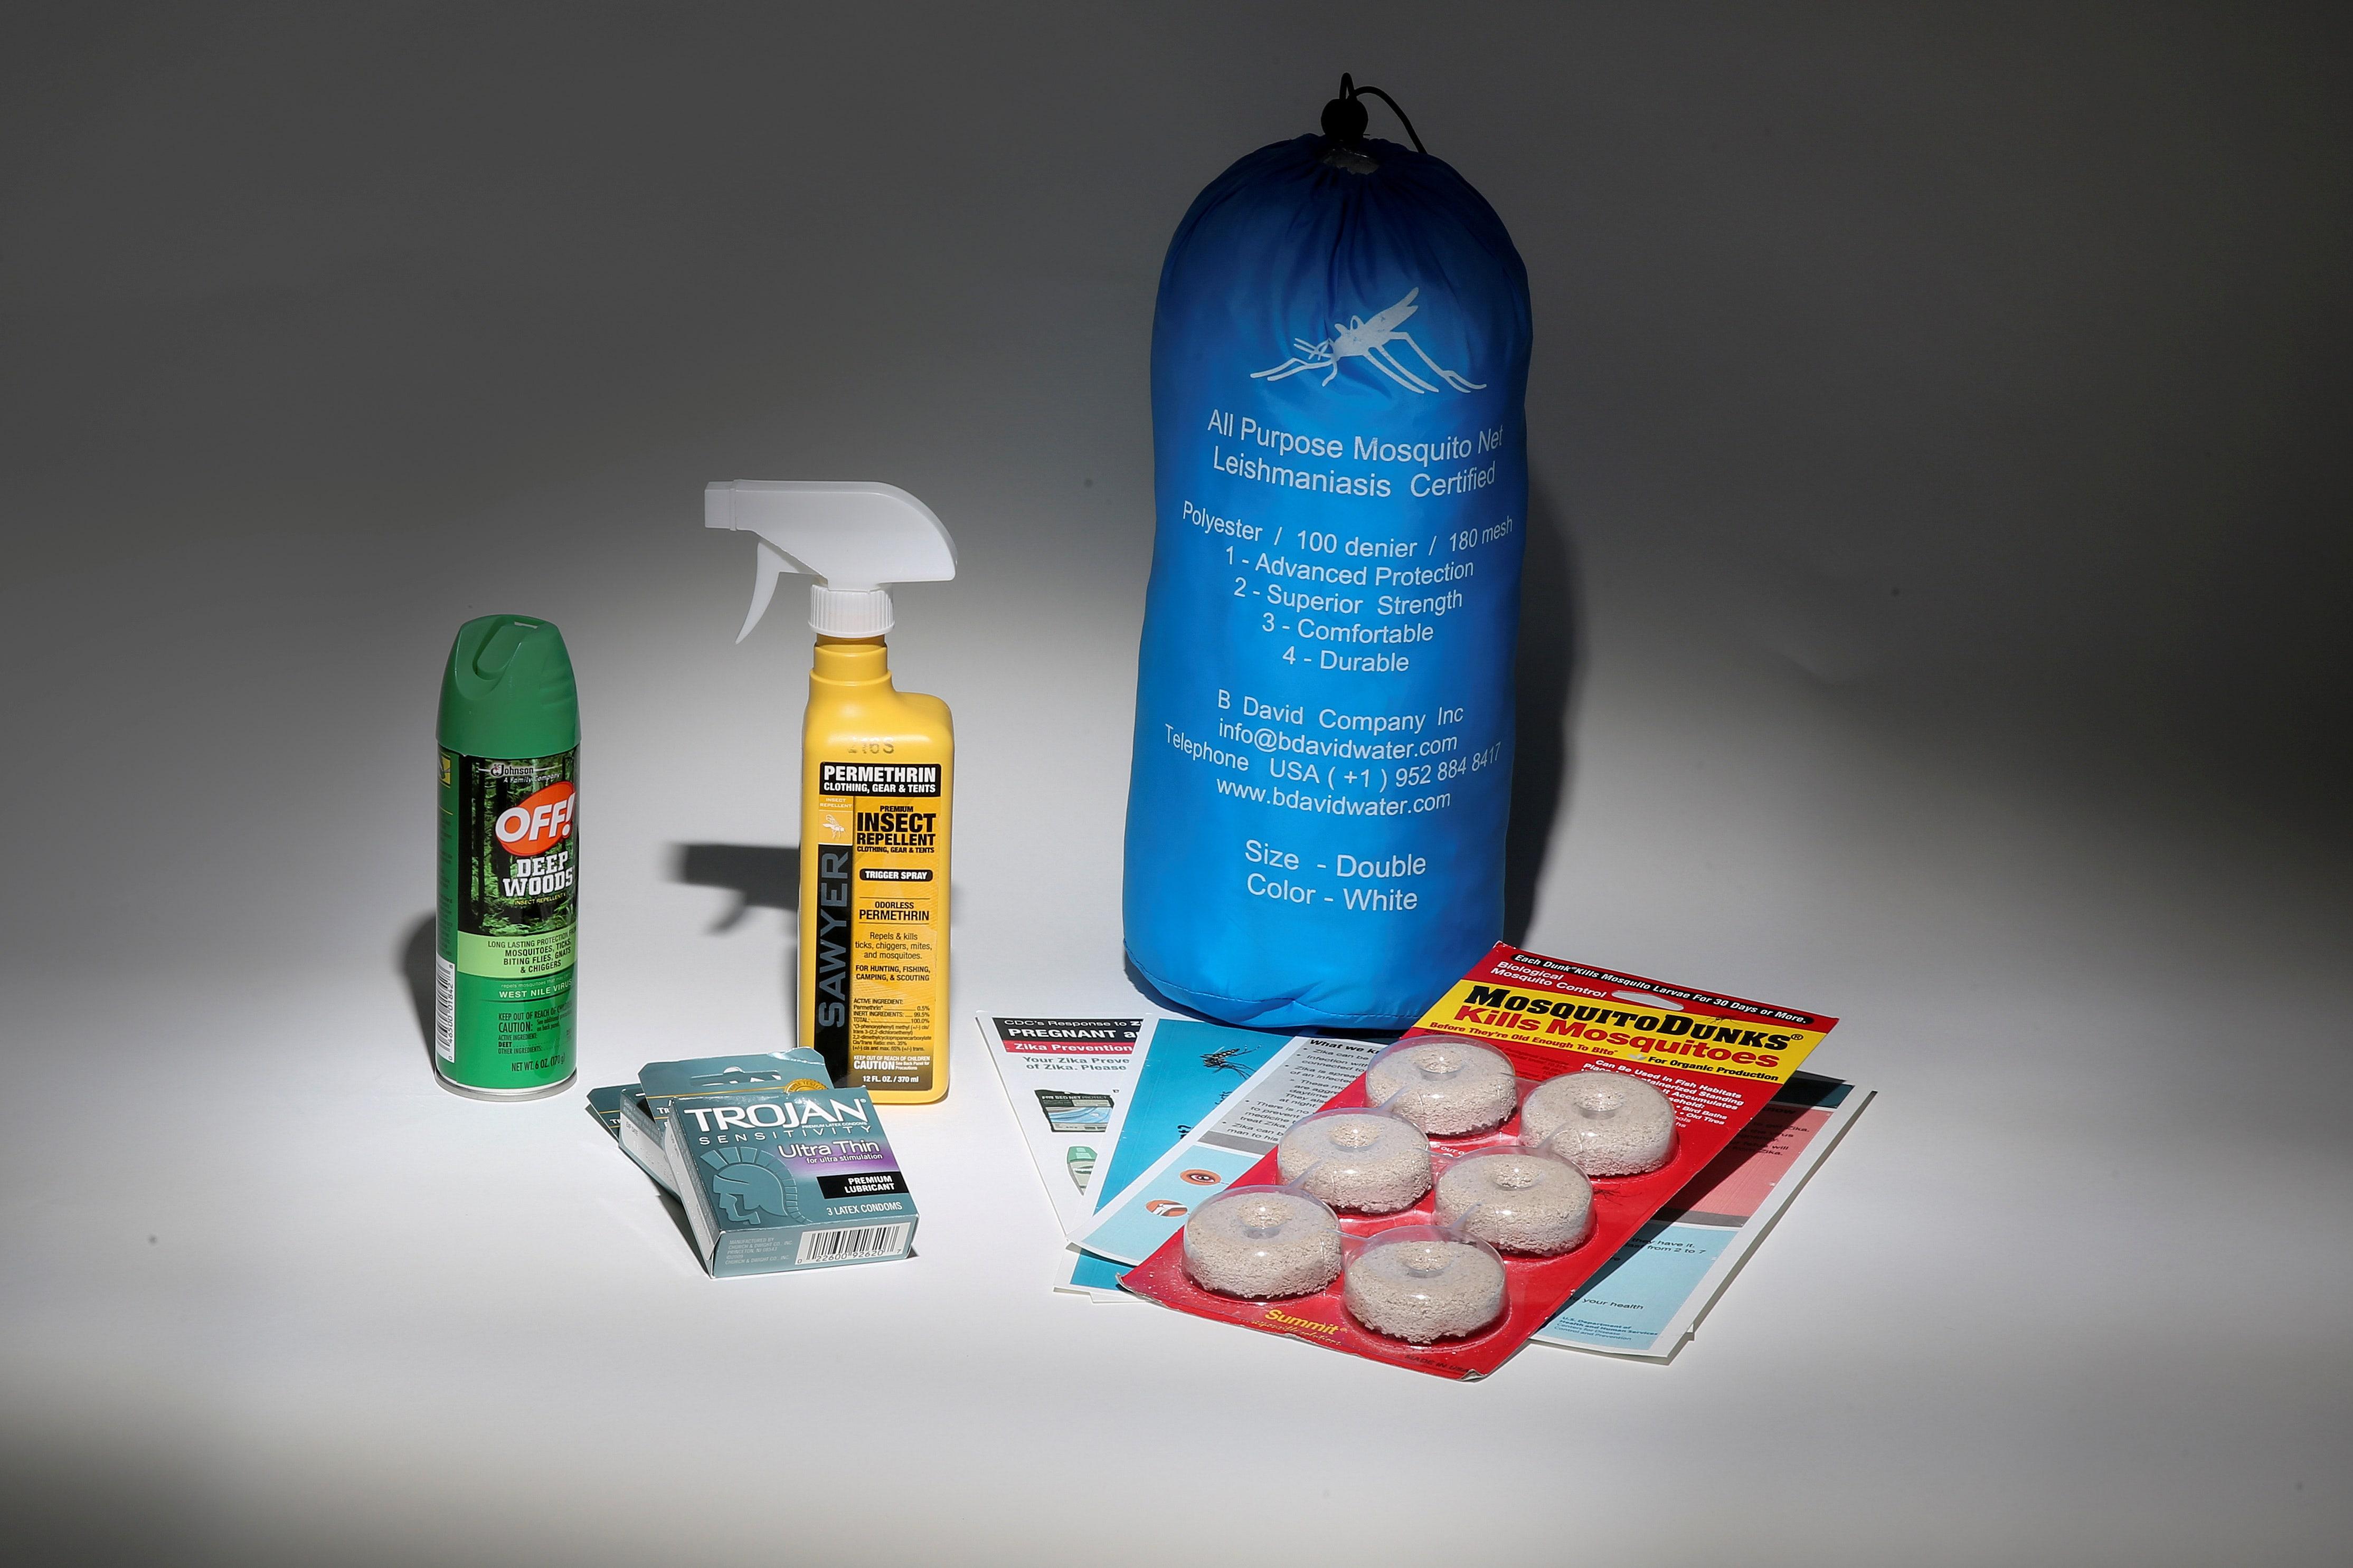 In CDC Zika prevention kits, female condoms spotlighted